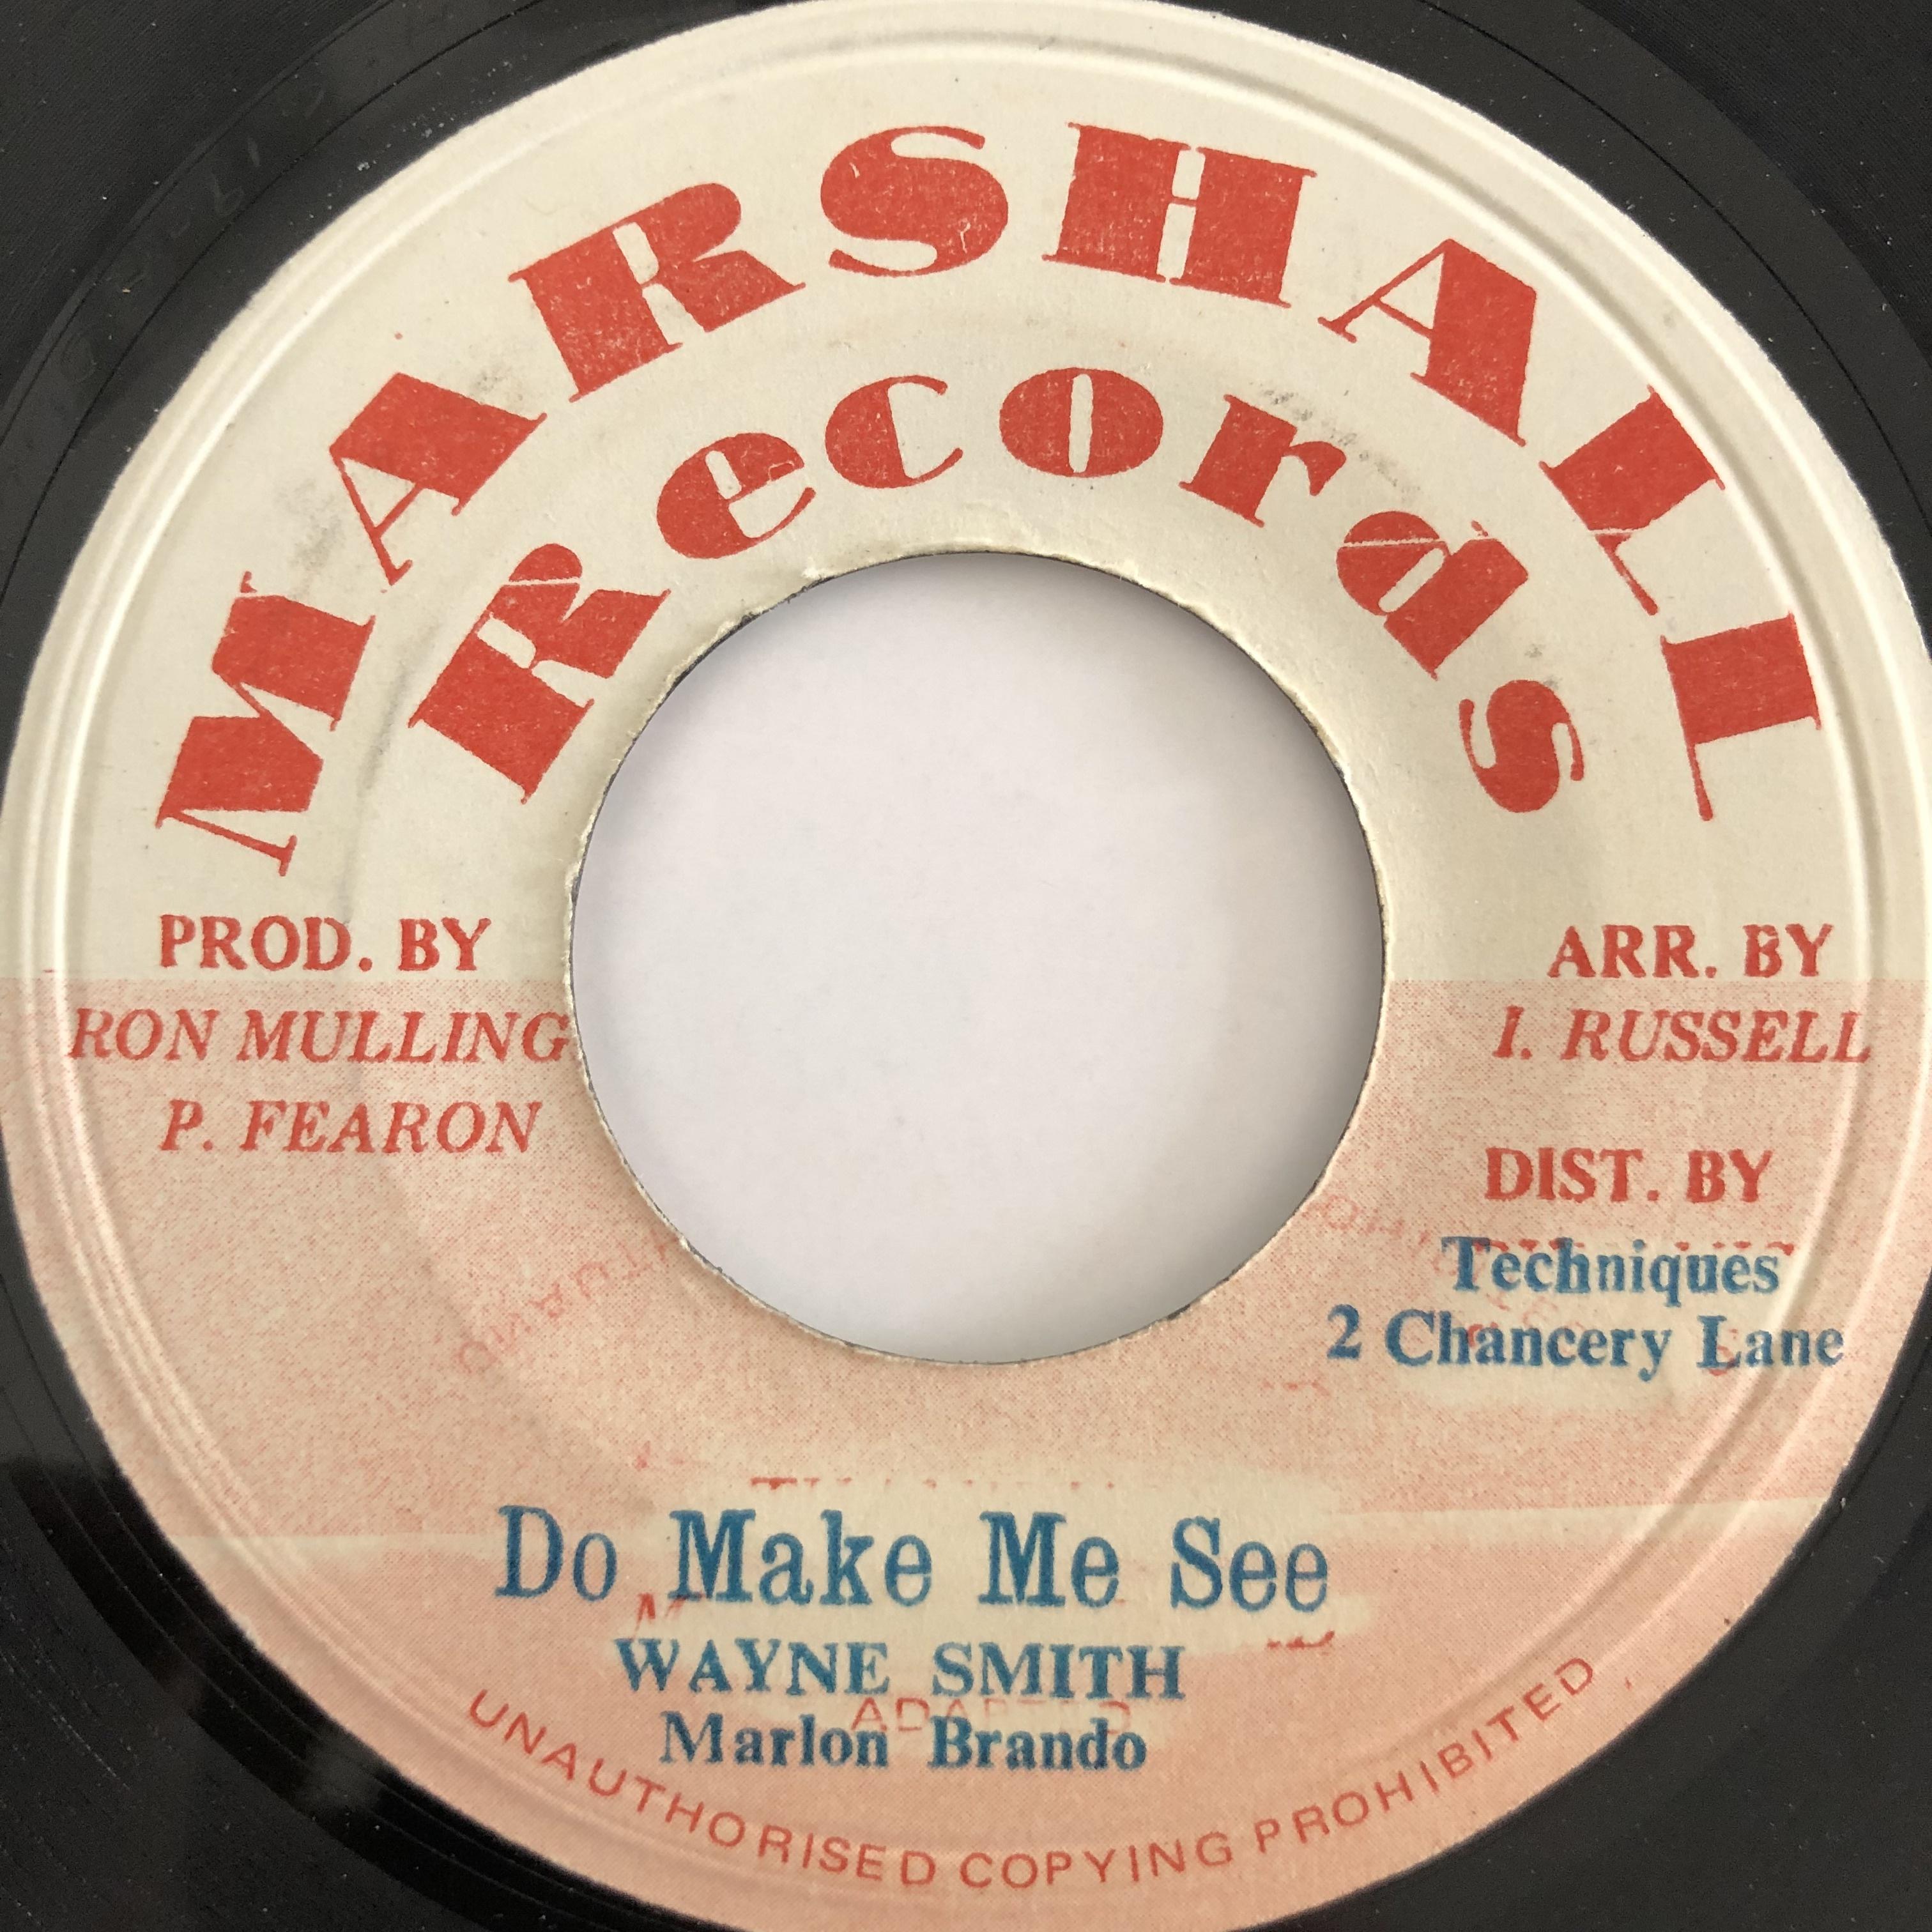 Wayne Smith & Marlon Brando - Do Make Me See【7-20075】